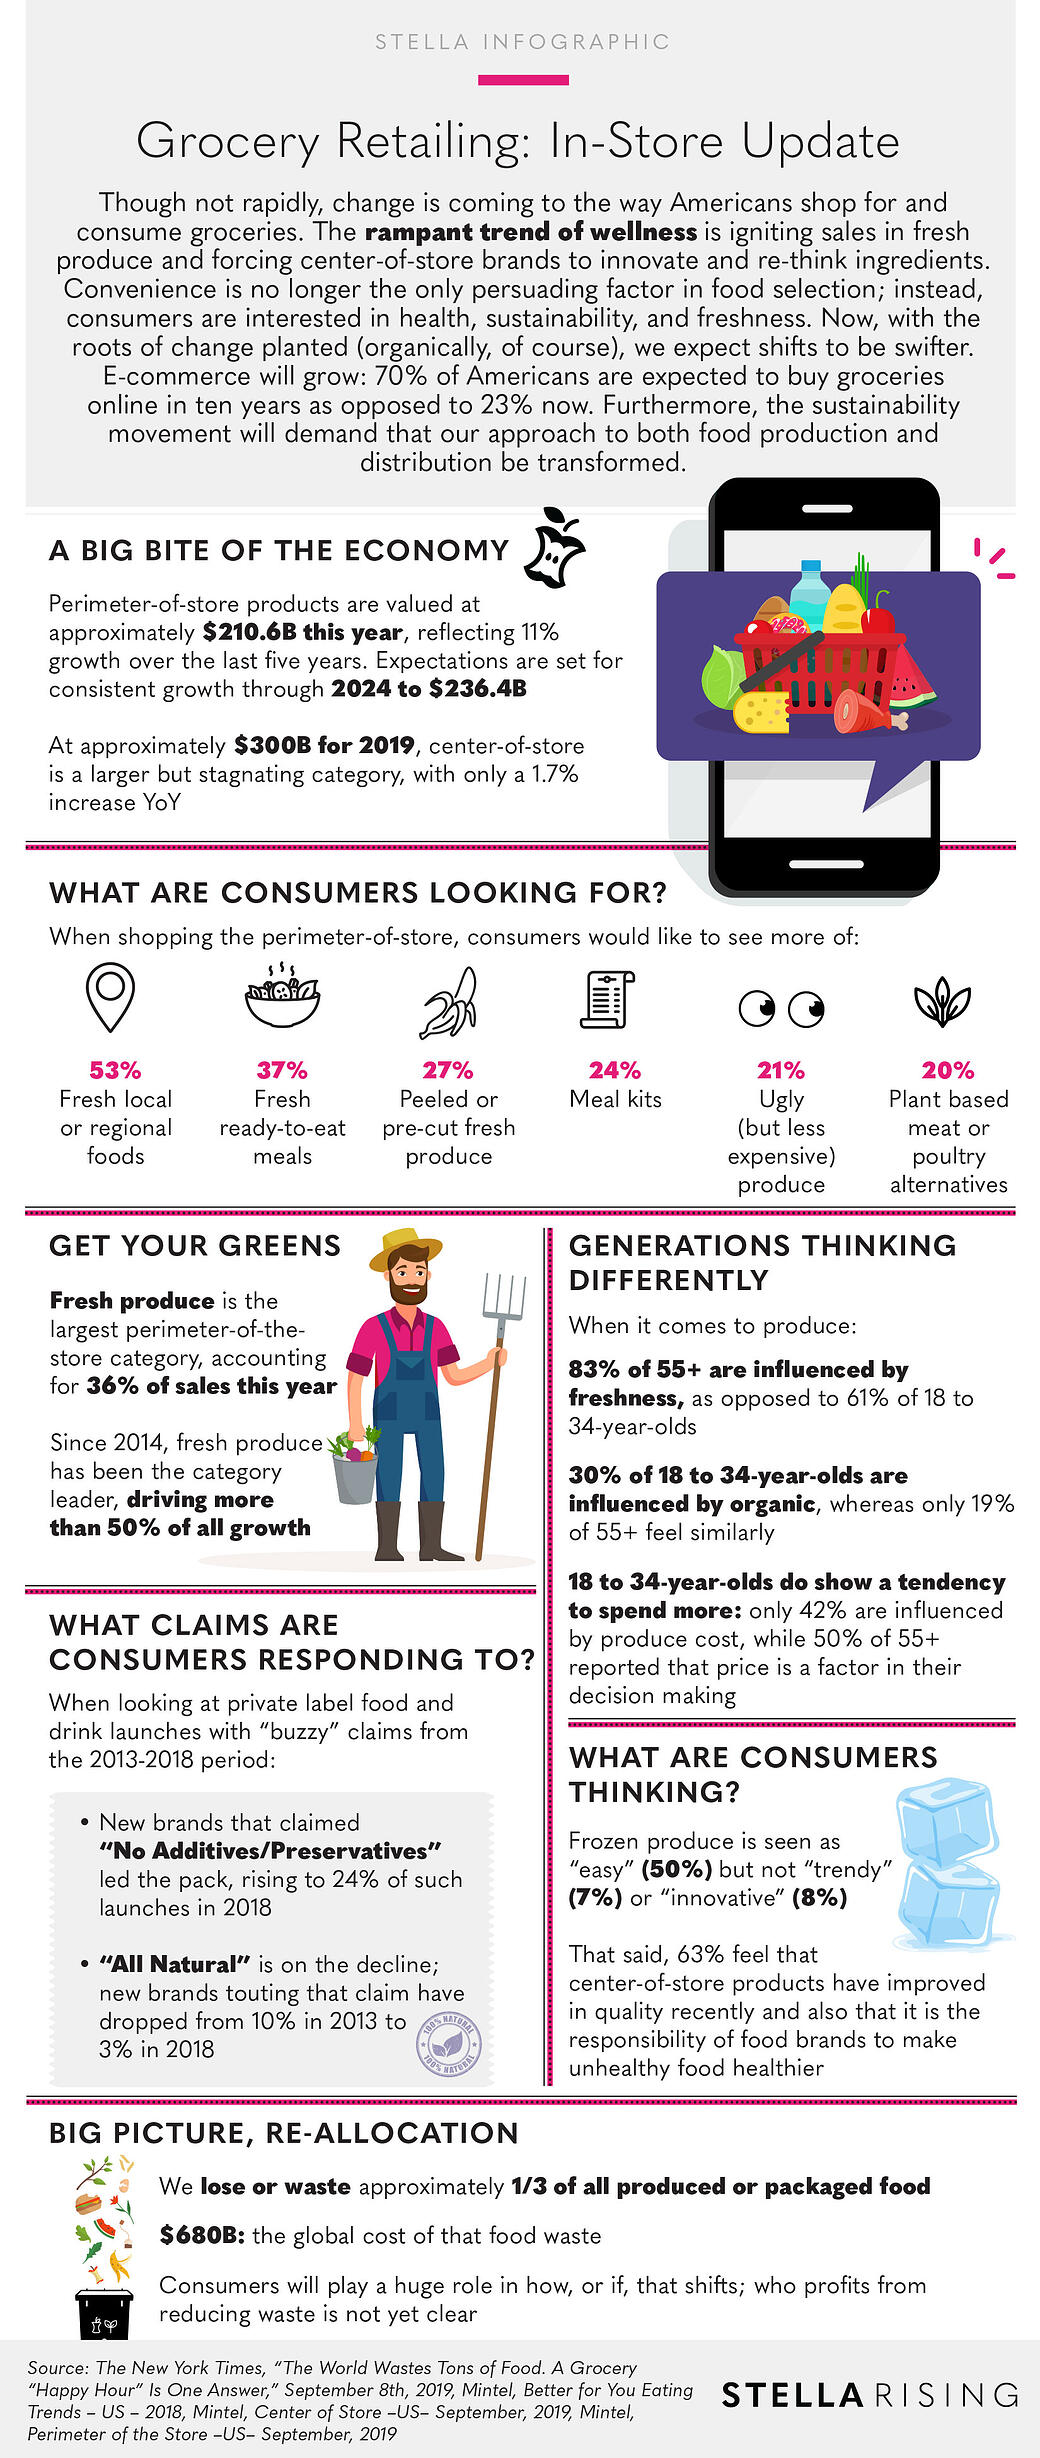 GroceryInStoreUpdate_Infographic